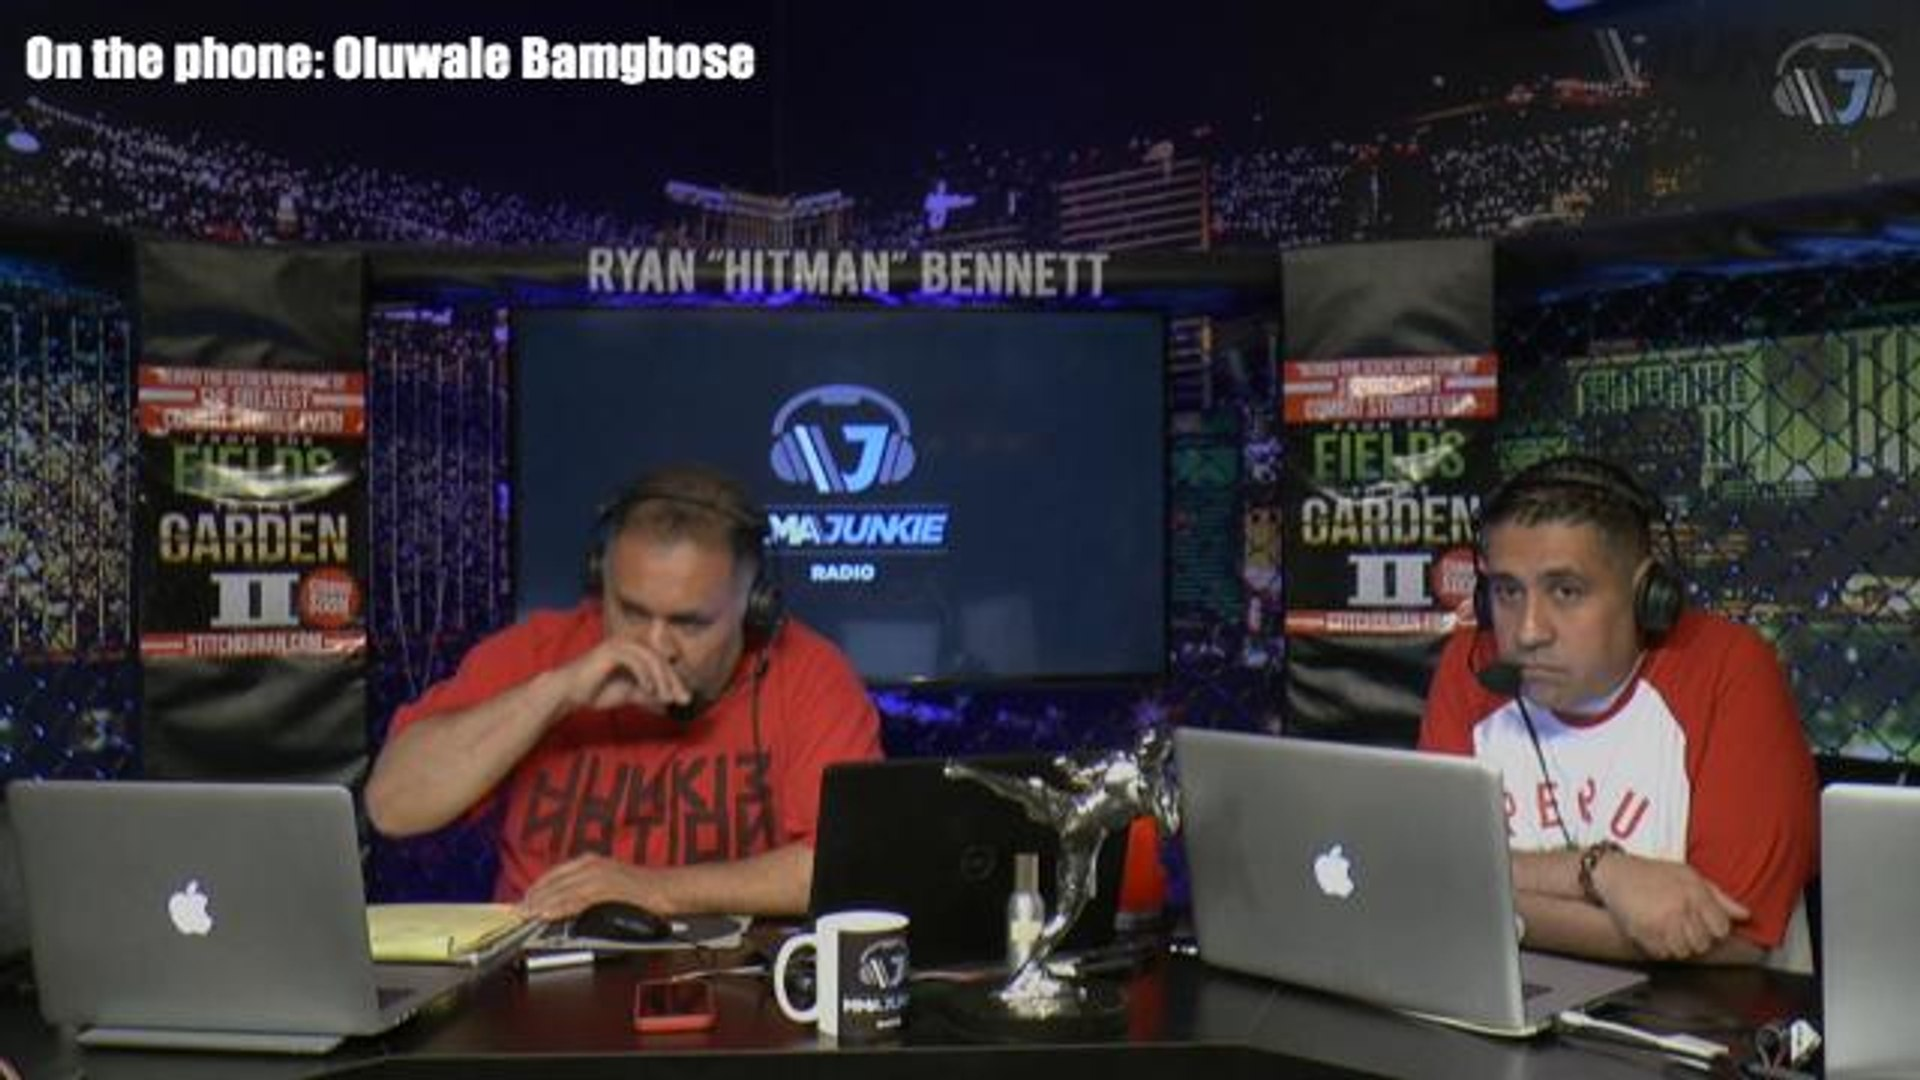 Oluwale Bamgbose looking to embarrass Paulo Borrachinha at UFC 212 in Rio